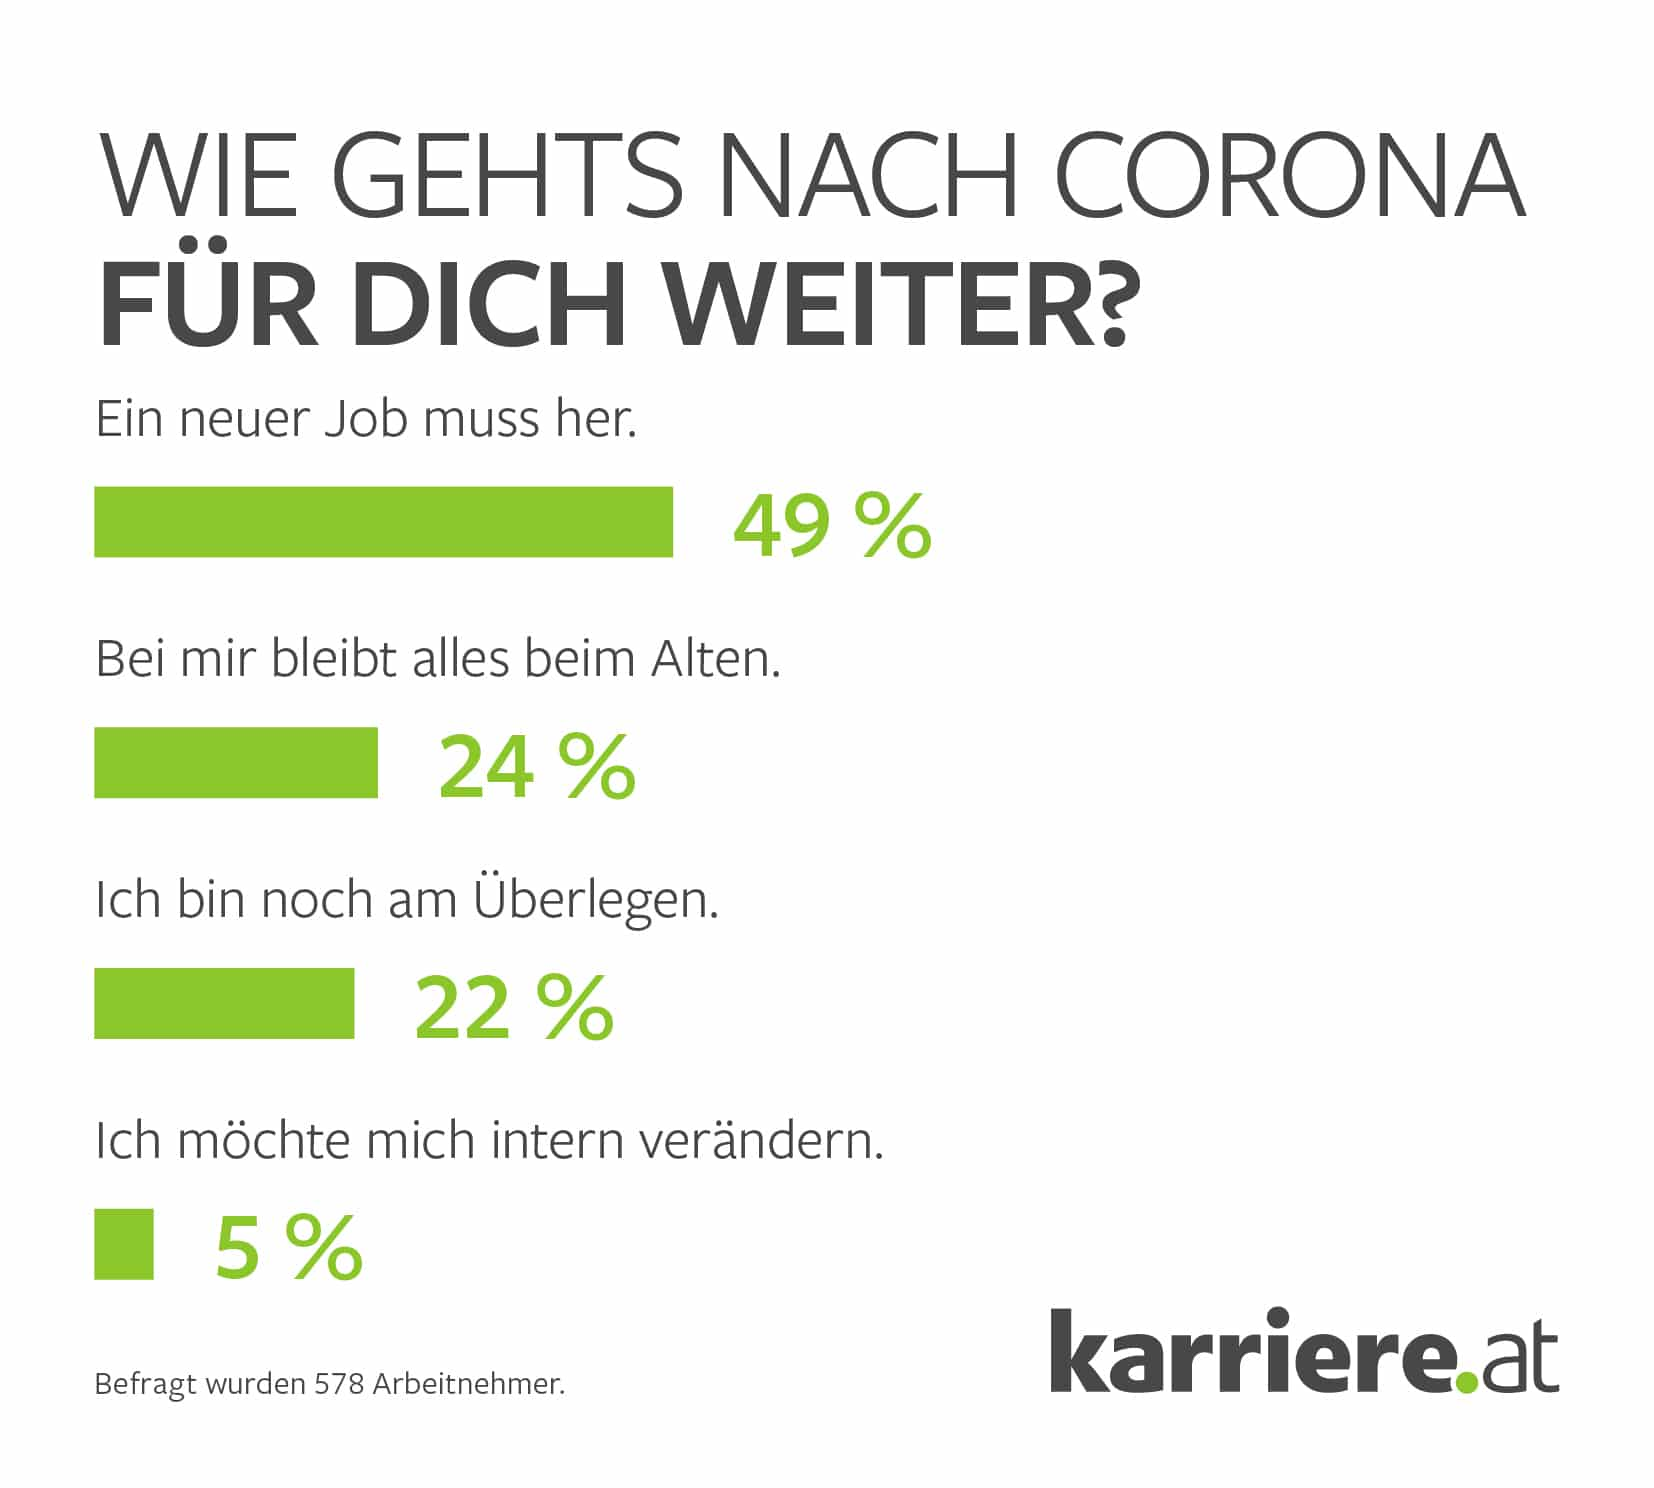 Nach Corona Jobwechsel Grafik 1 Arbeitnehmer